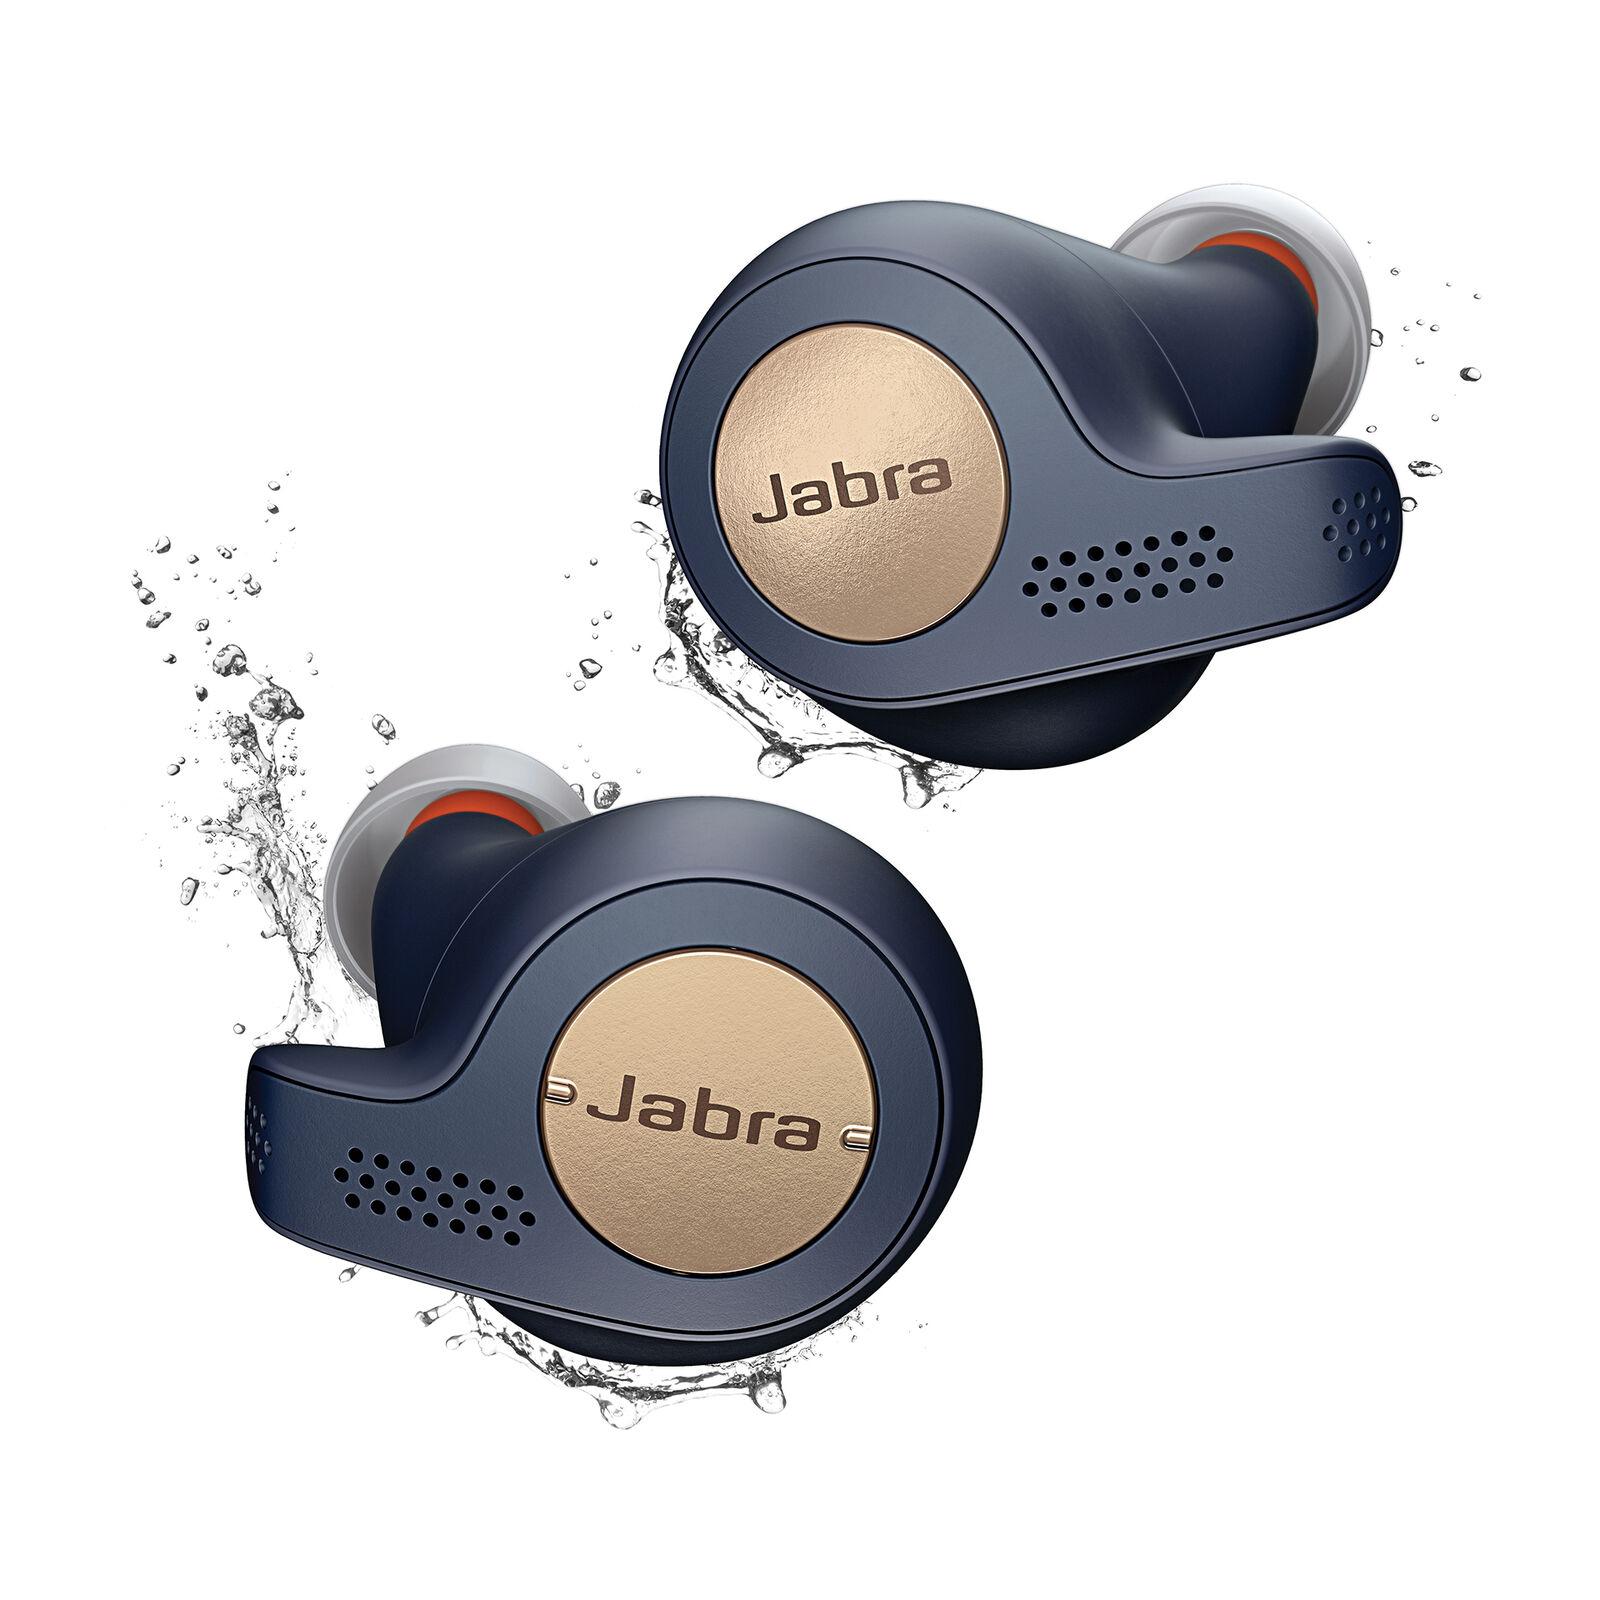 (Refurb - 2 year warranty) JABRA Elite Active 65t Wireless Bluetooth Headphones - £59.99 with code at jabra-company-store-uk/ebay